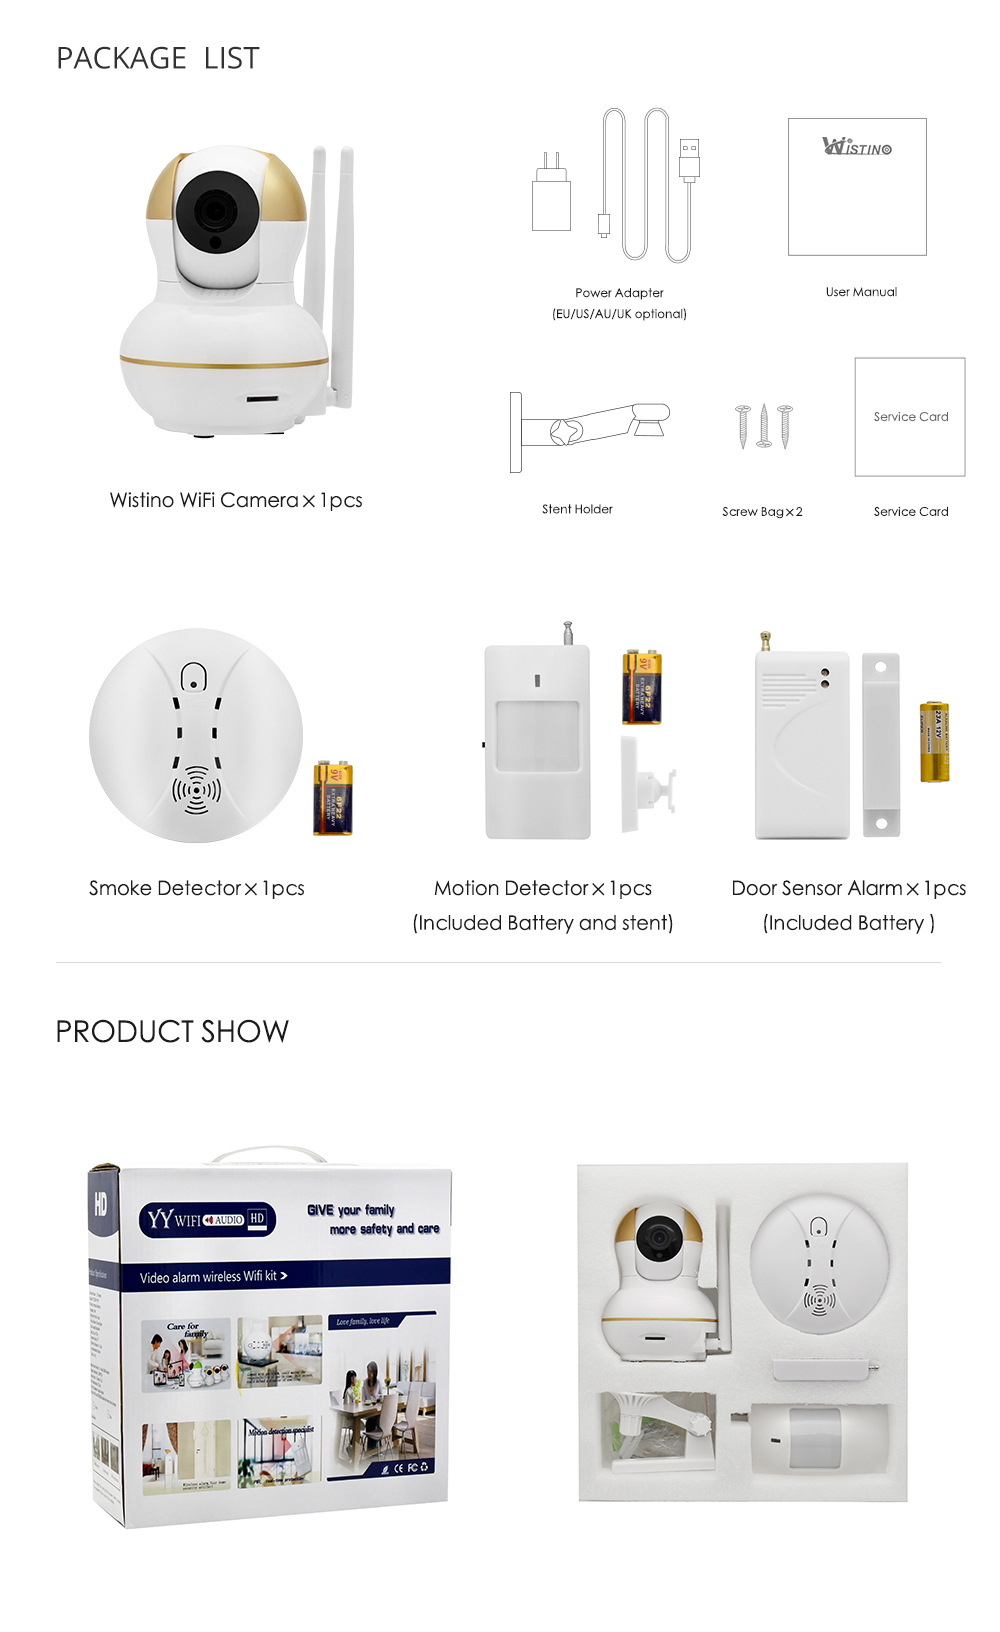 Wistino Alarm Systems Security WIFI IP Camera Security System Video Monitor Surveillance Camera Wireless Home Alarm System With Sensor Alarm Wifi kit Smart Home Camera 14-1